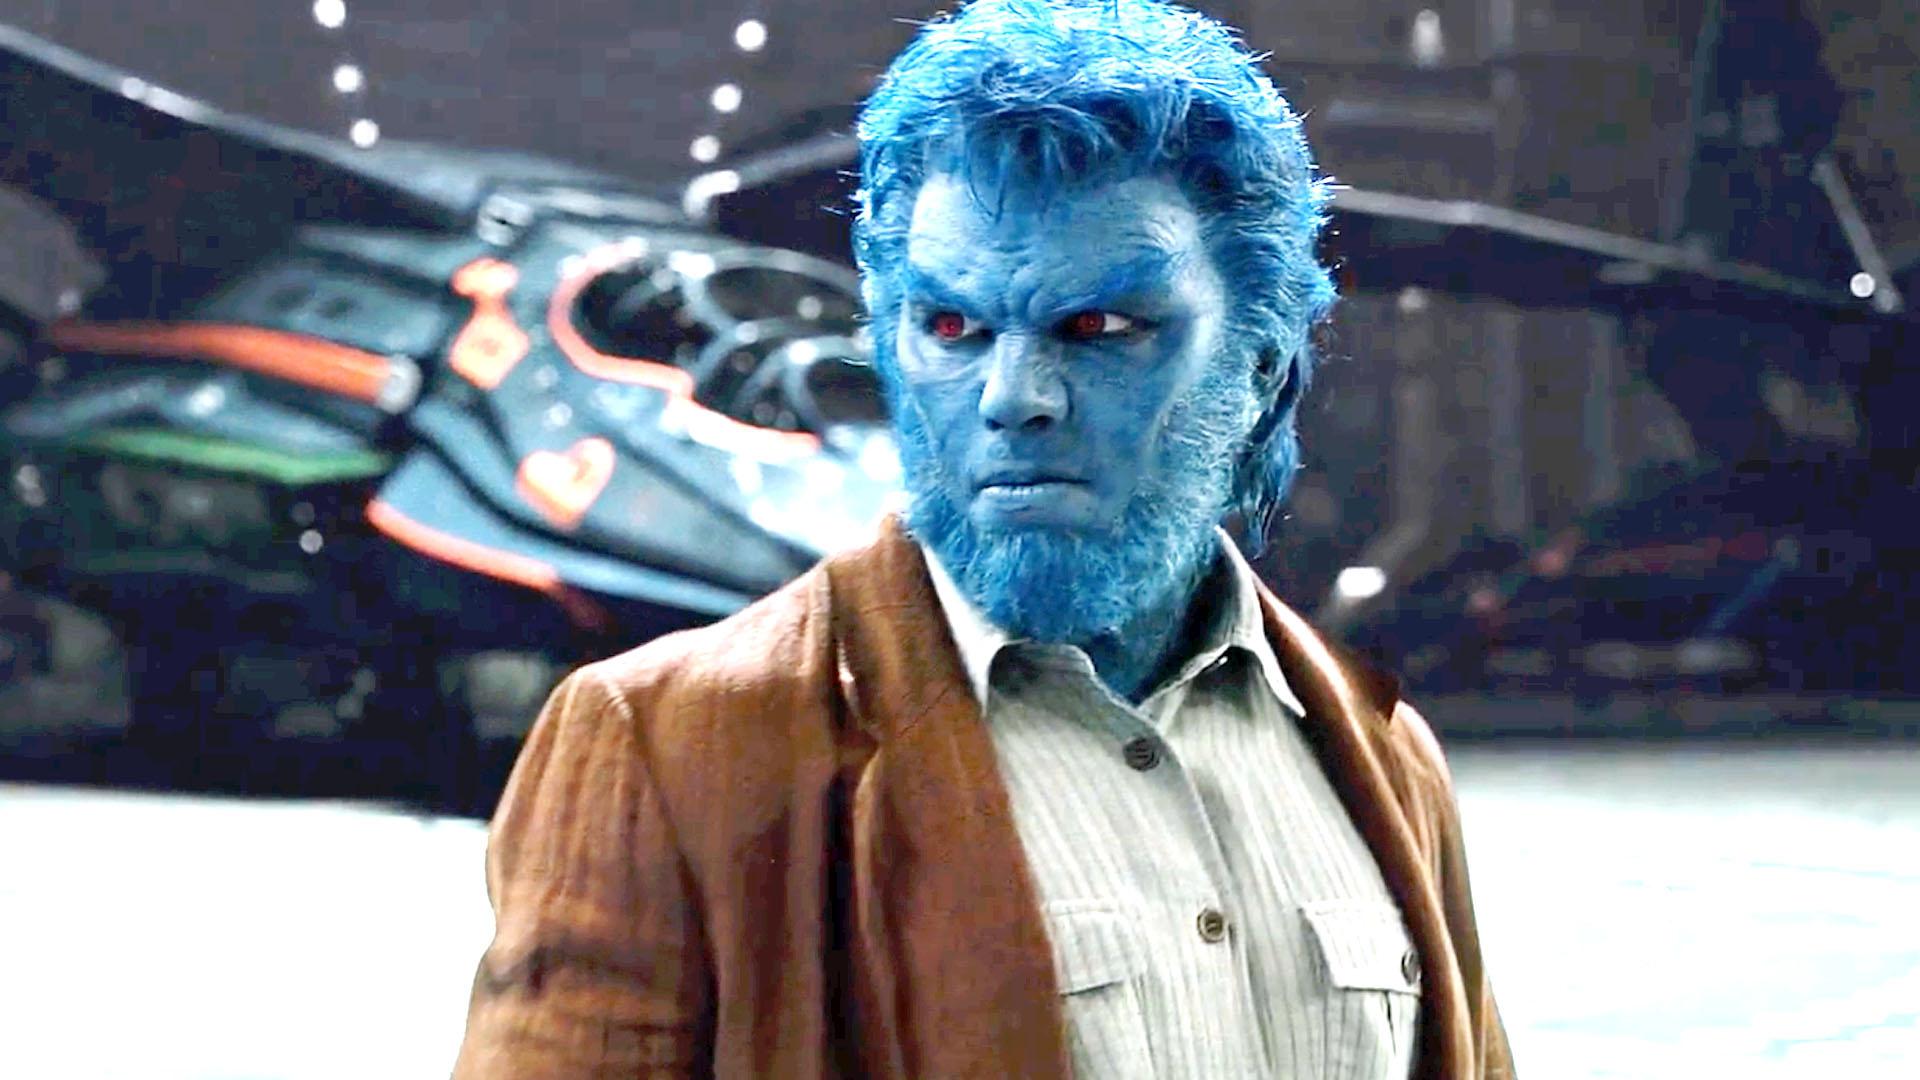 X-Men: Apocalypse (201... Michael Fassbender Movies